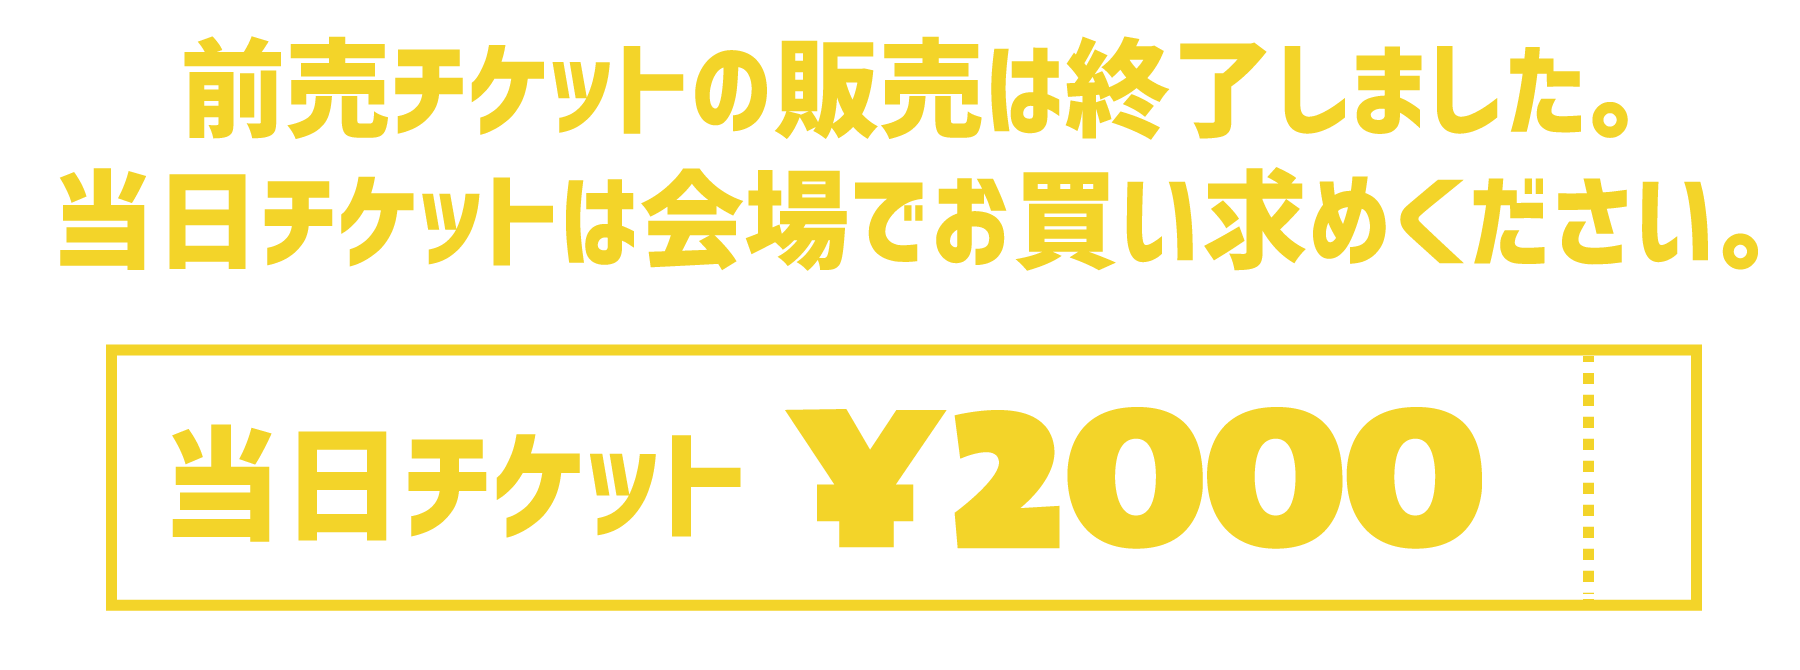 ticket_2-07